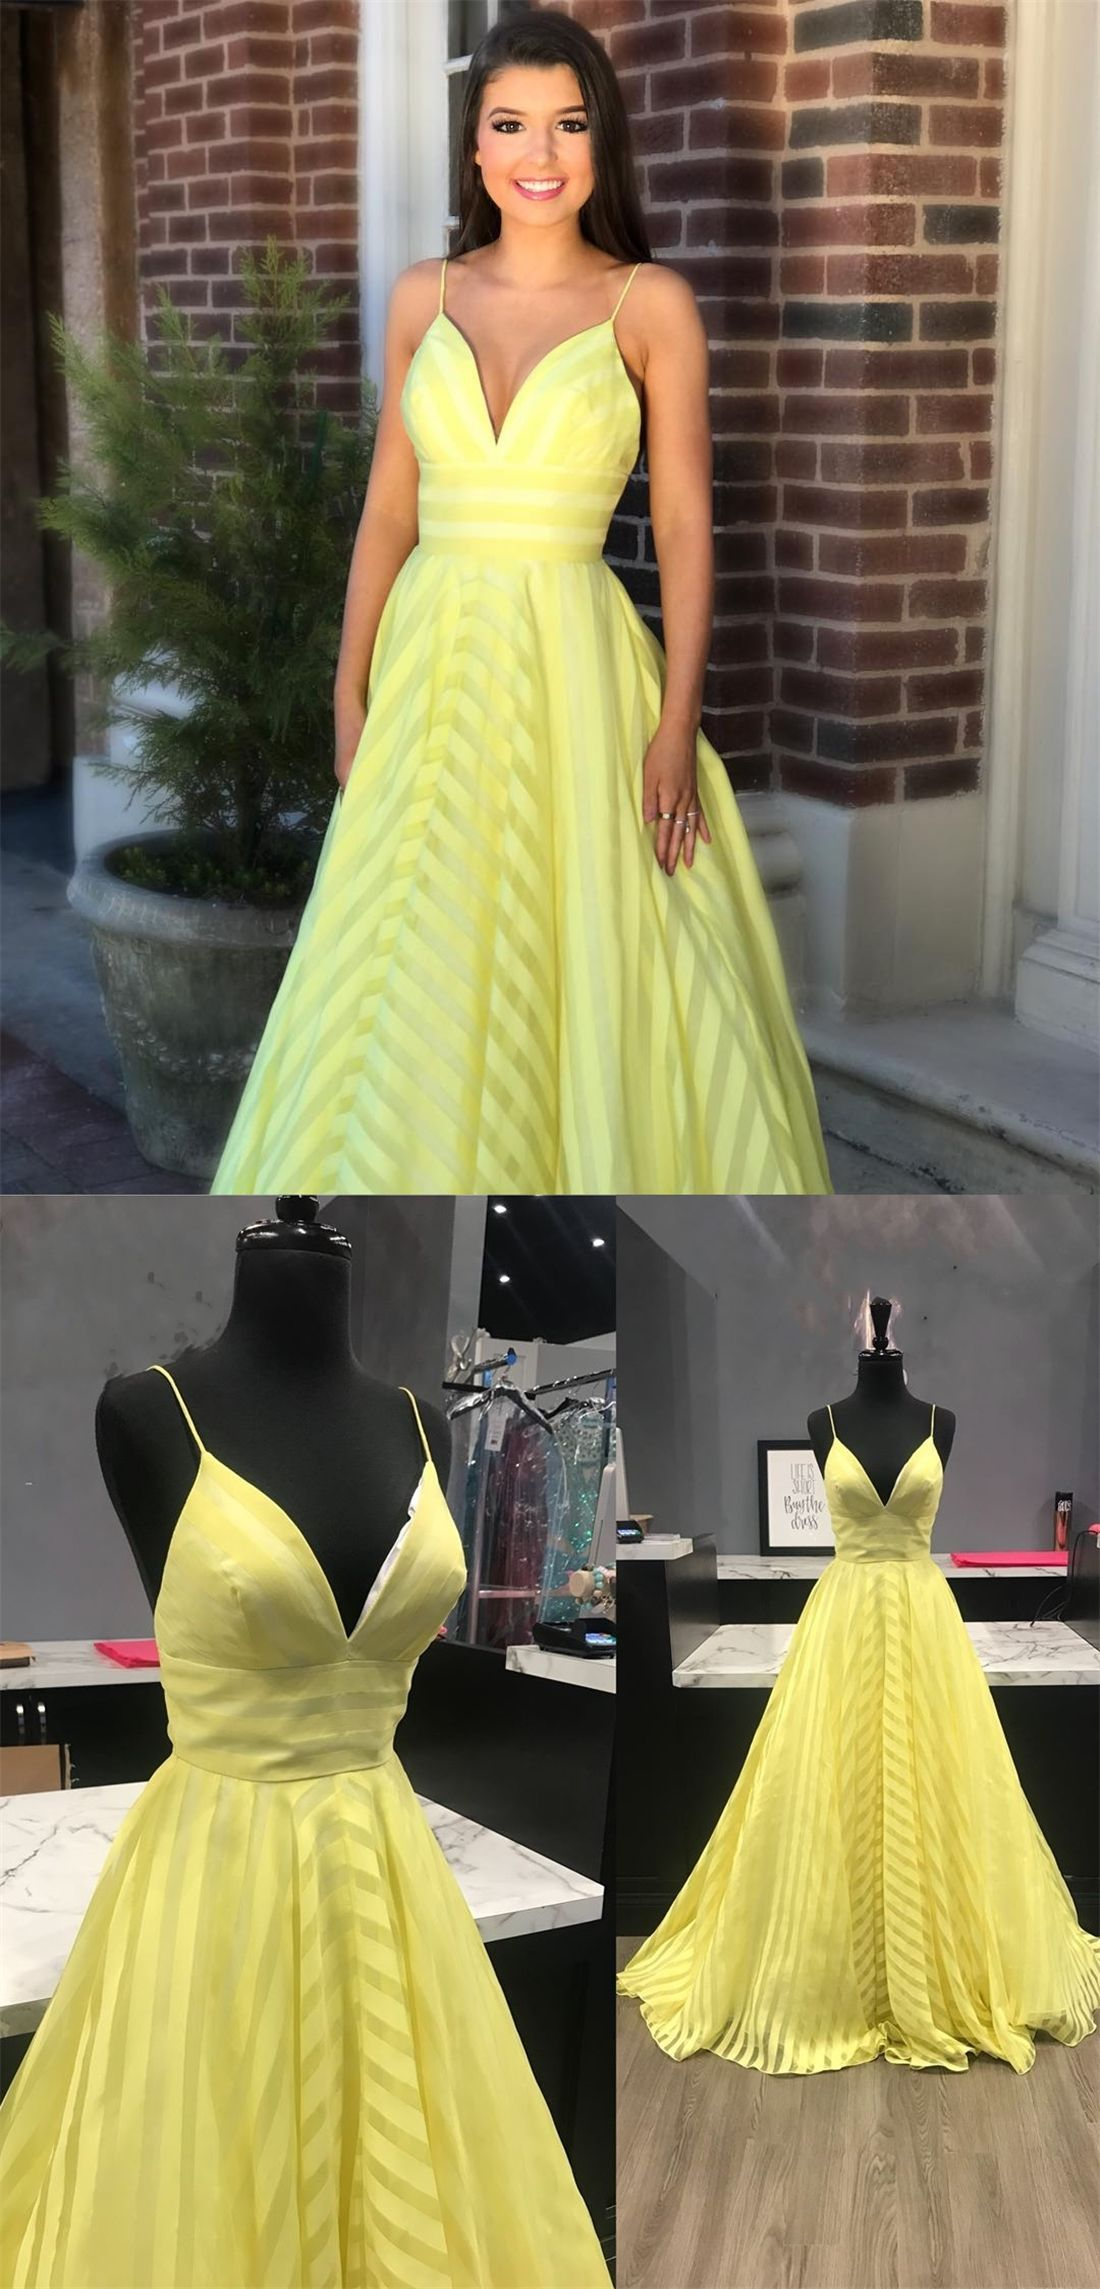 b8107626a31 A-Line Spaghetti Straps Yellow Elastic Satin Prom Dress